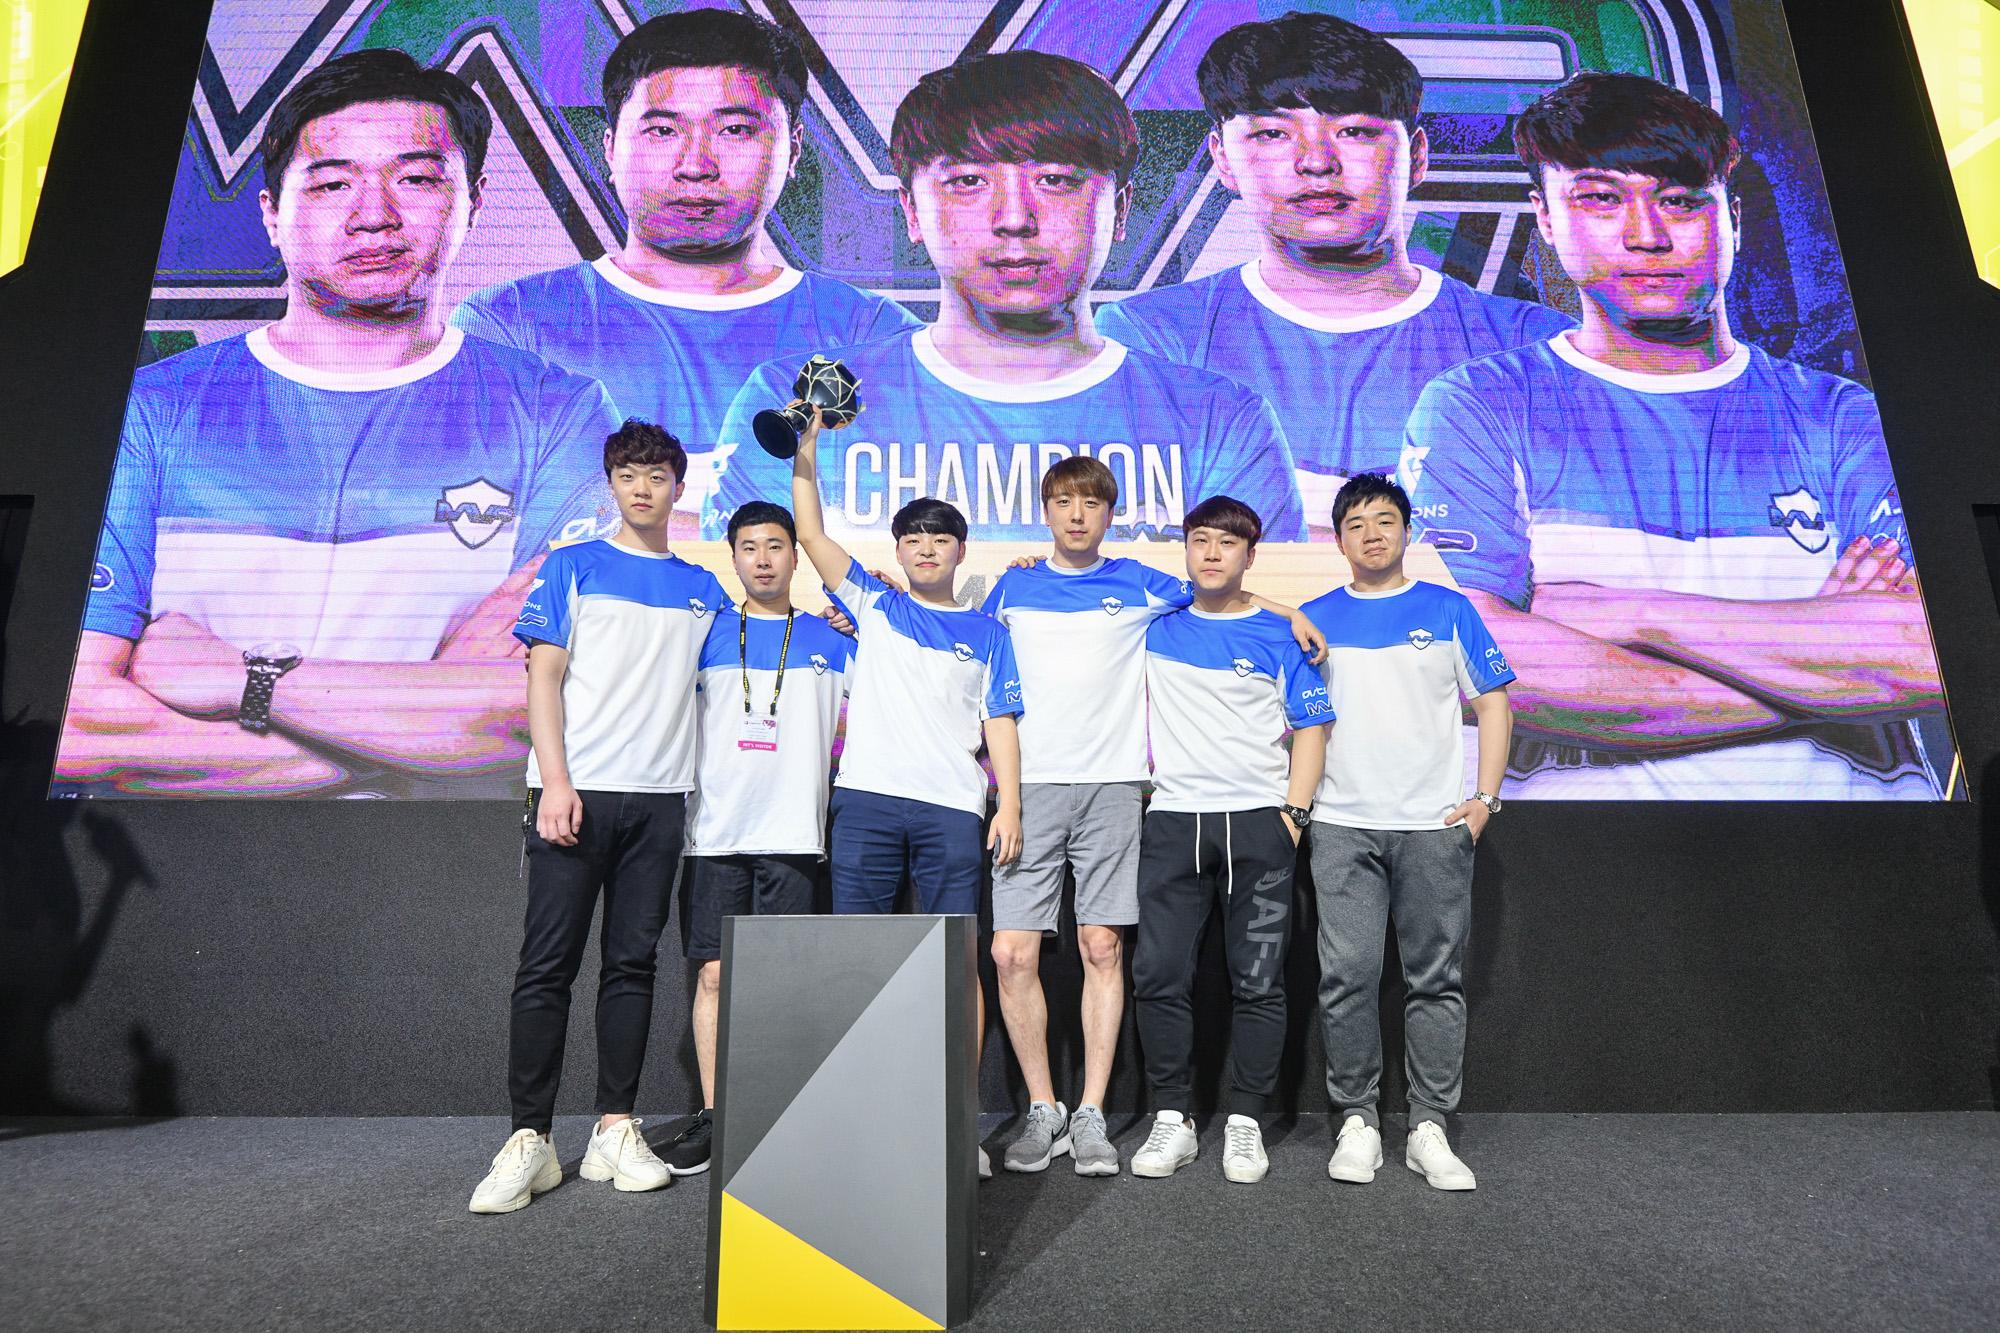 ZOTAC CUP MASTERS 亞洲區決賽冠軍出爐 韓國隊 MVP PK 殺入總決賽爭奪 30 萬美元總獎金